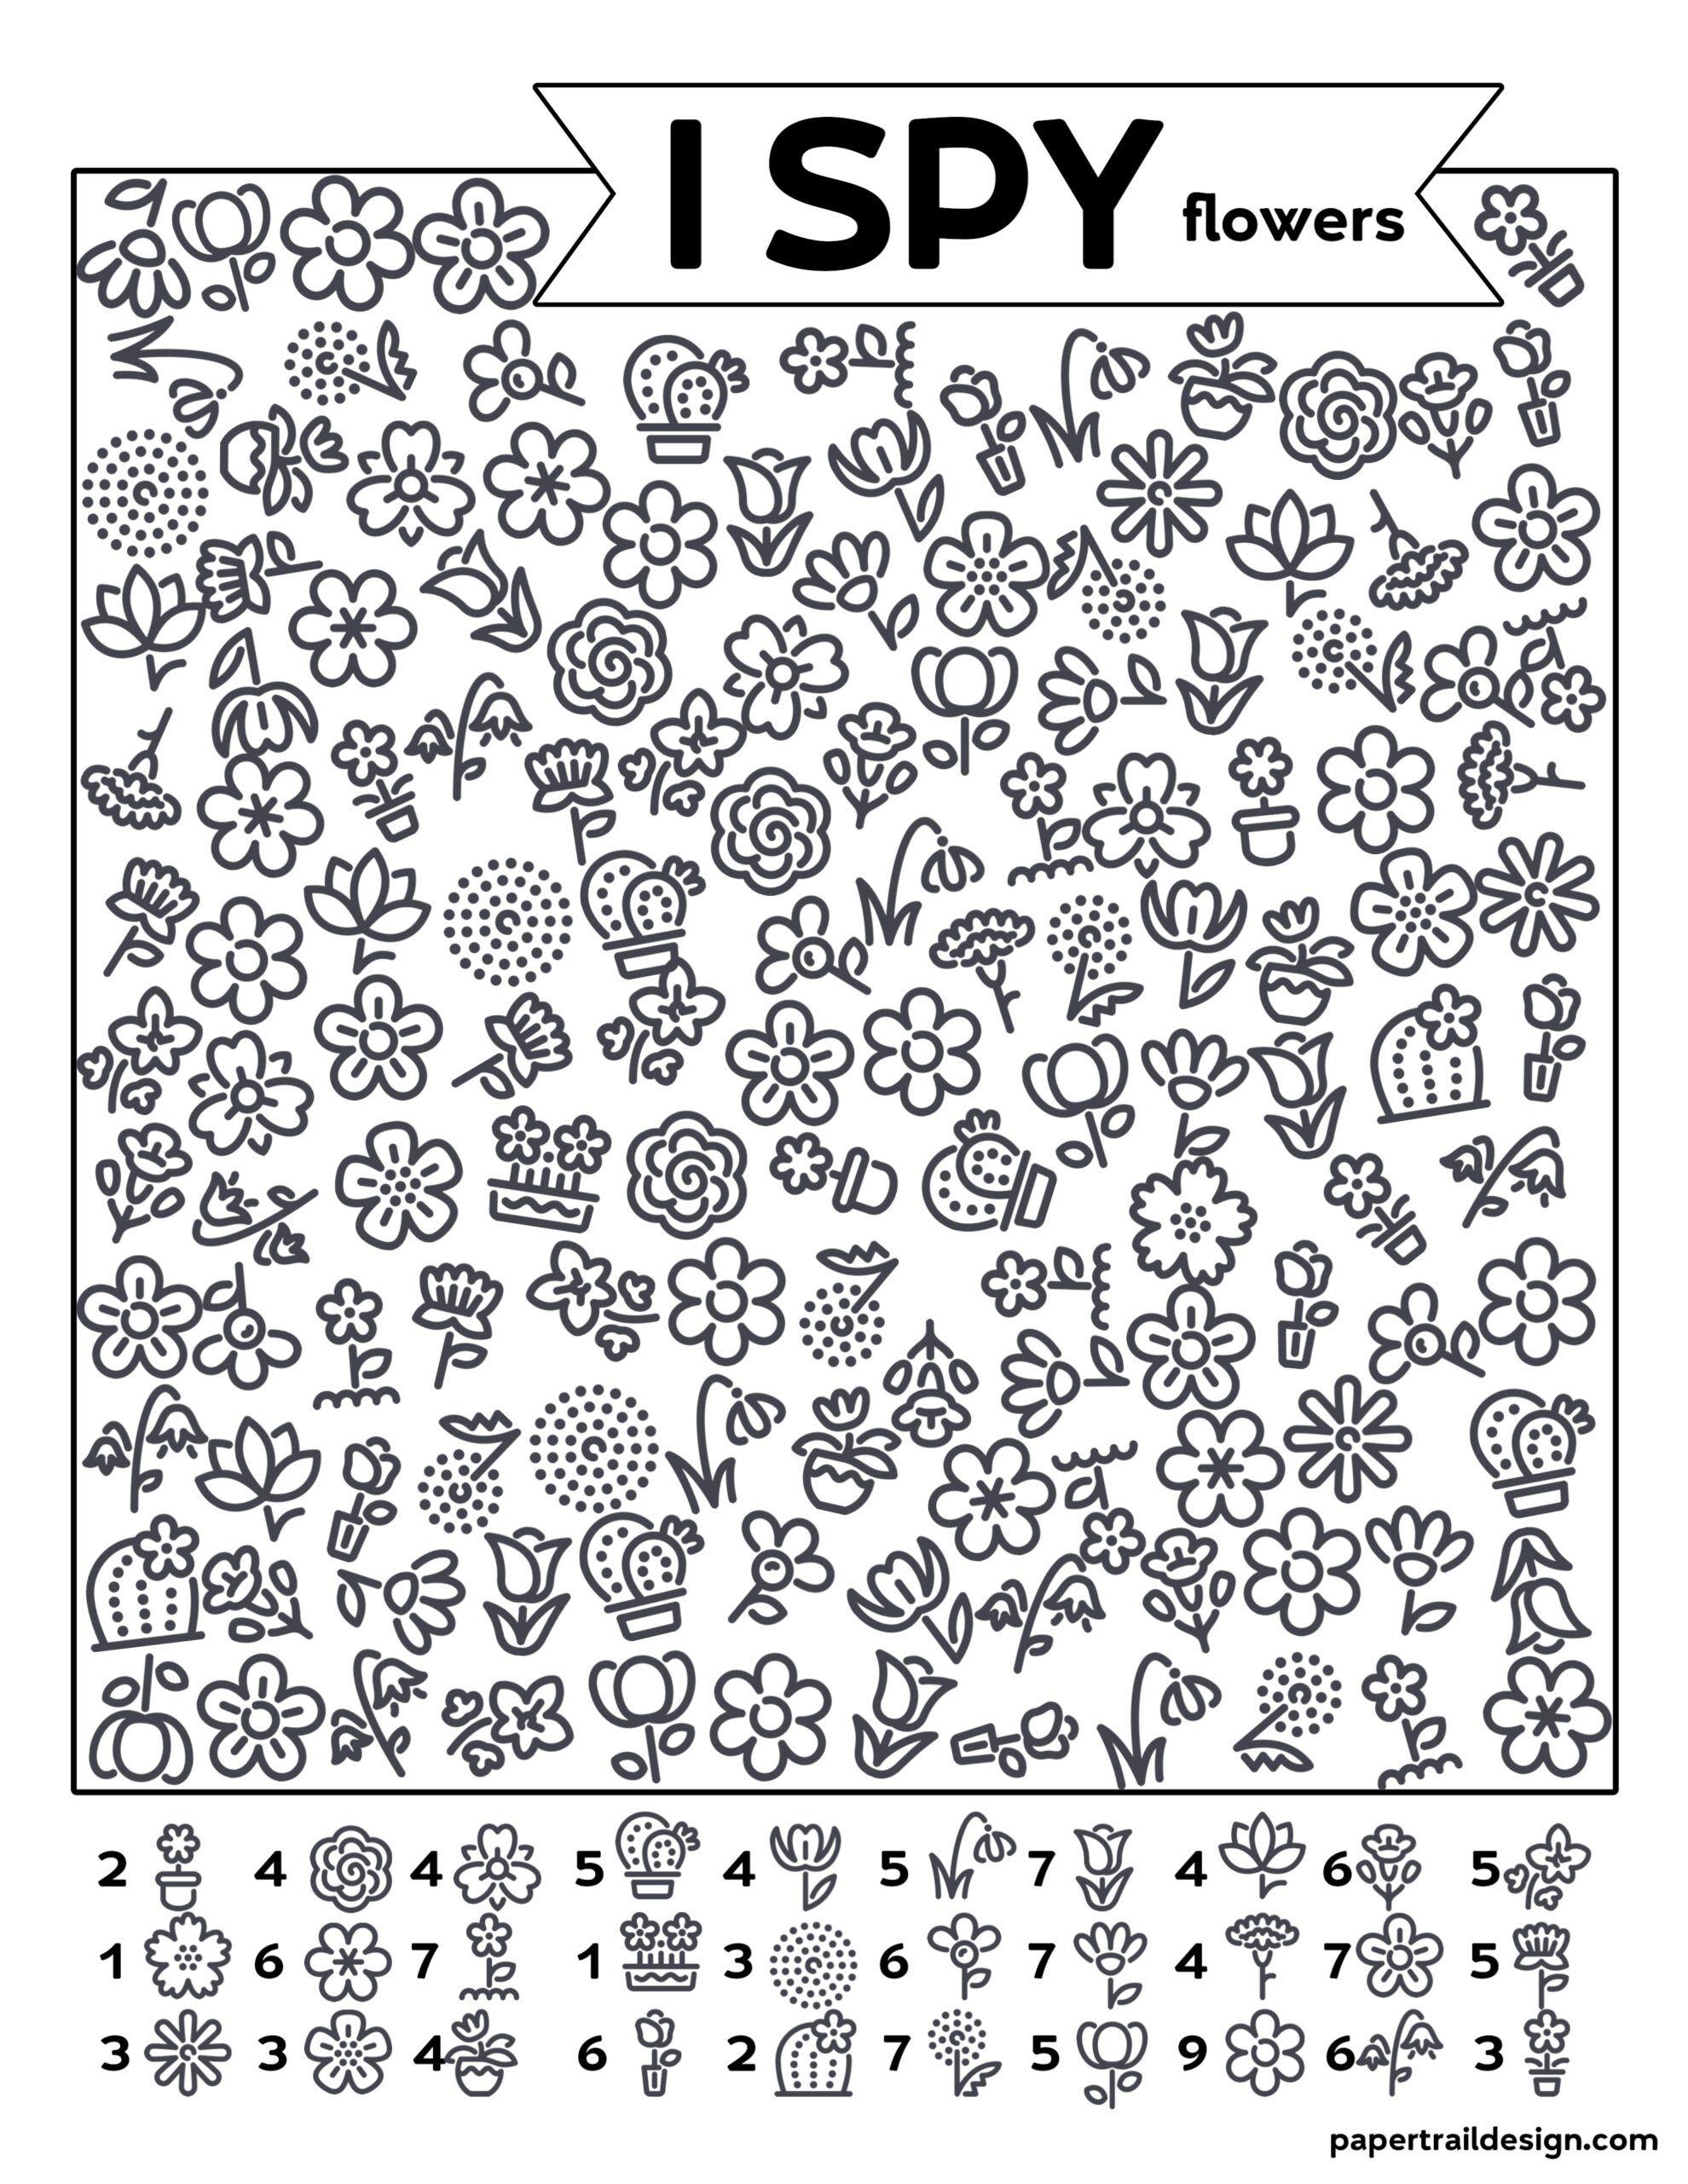 Free Printable I Spy Flowers Activity